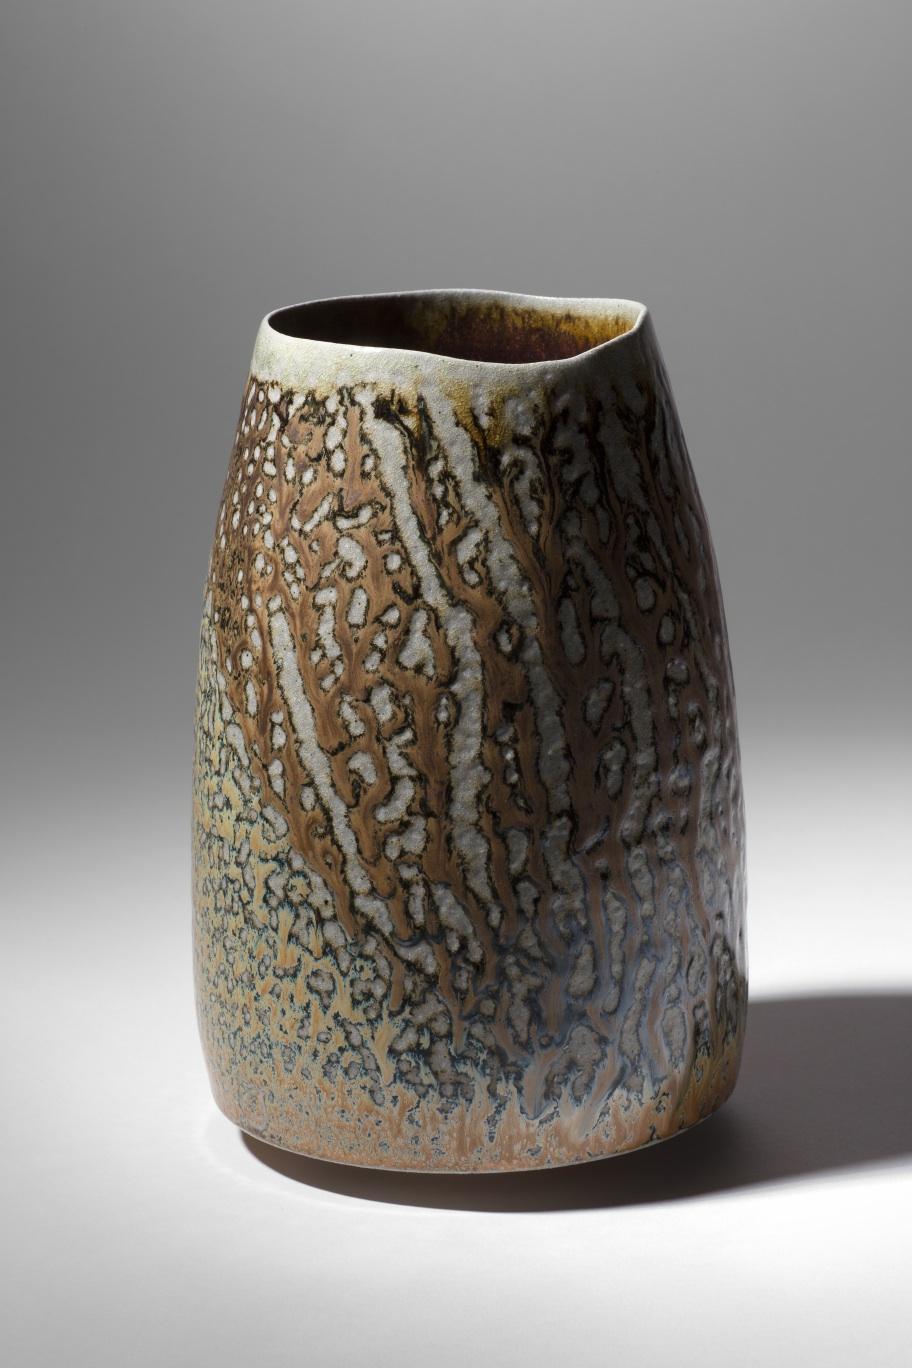 Mandy Parslow, MP08 Barrel Vessel, wood fired salt glazed stoneware, 21 x 14cm, EUR 380